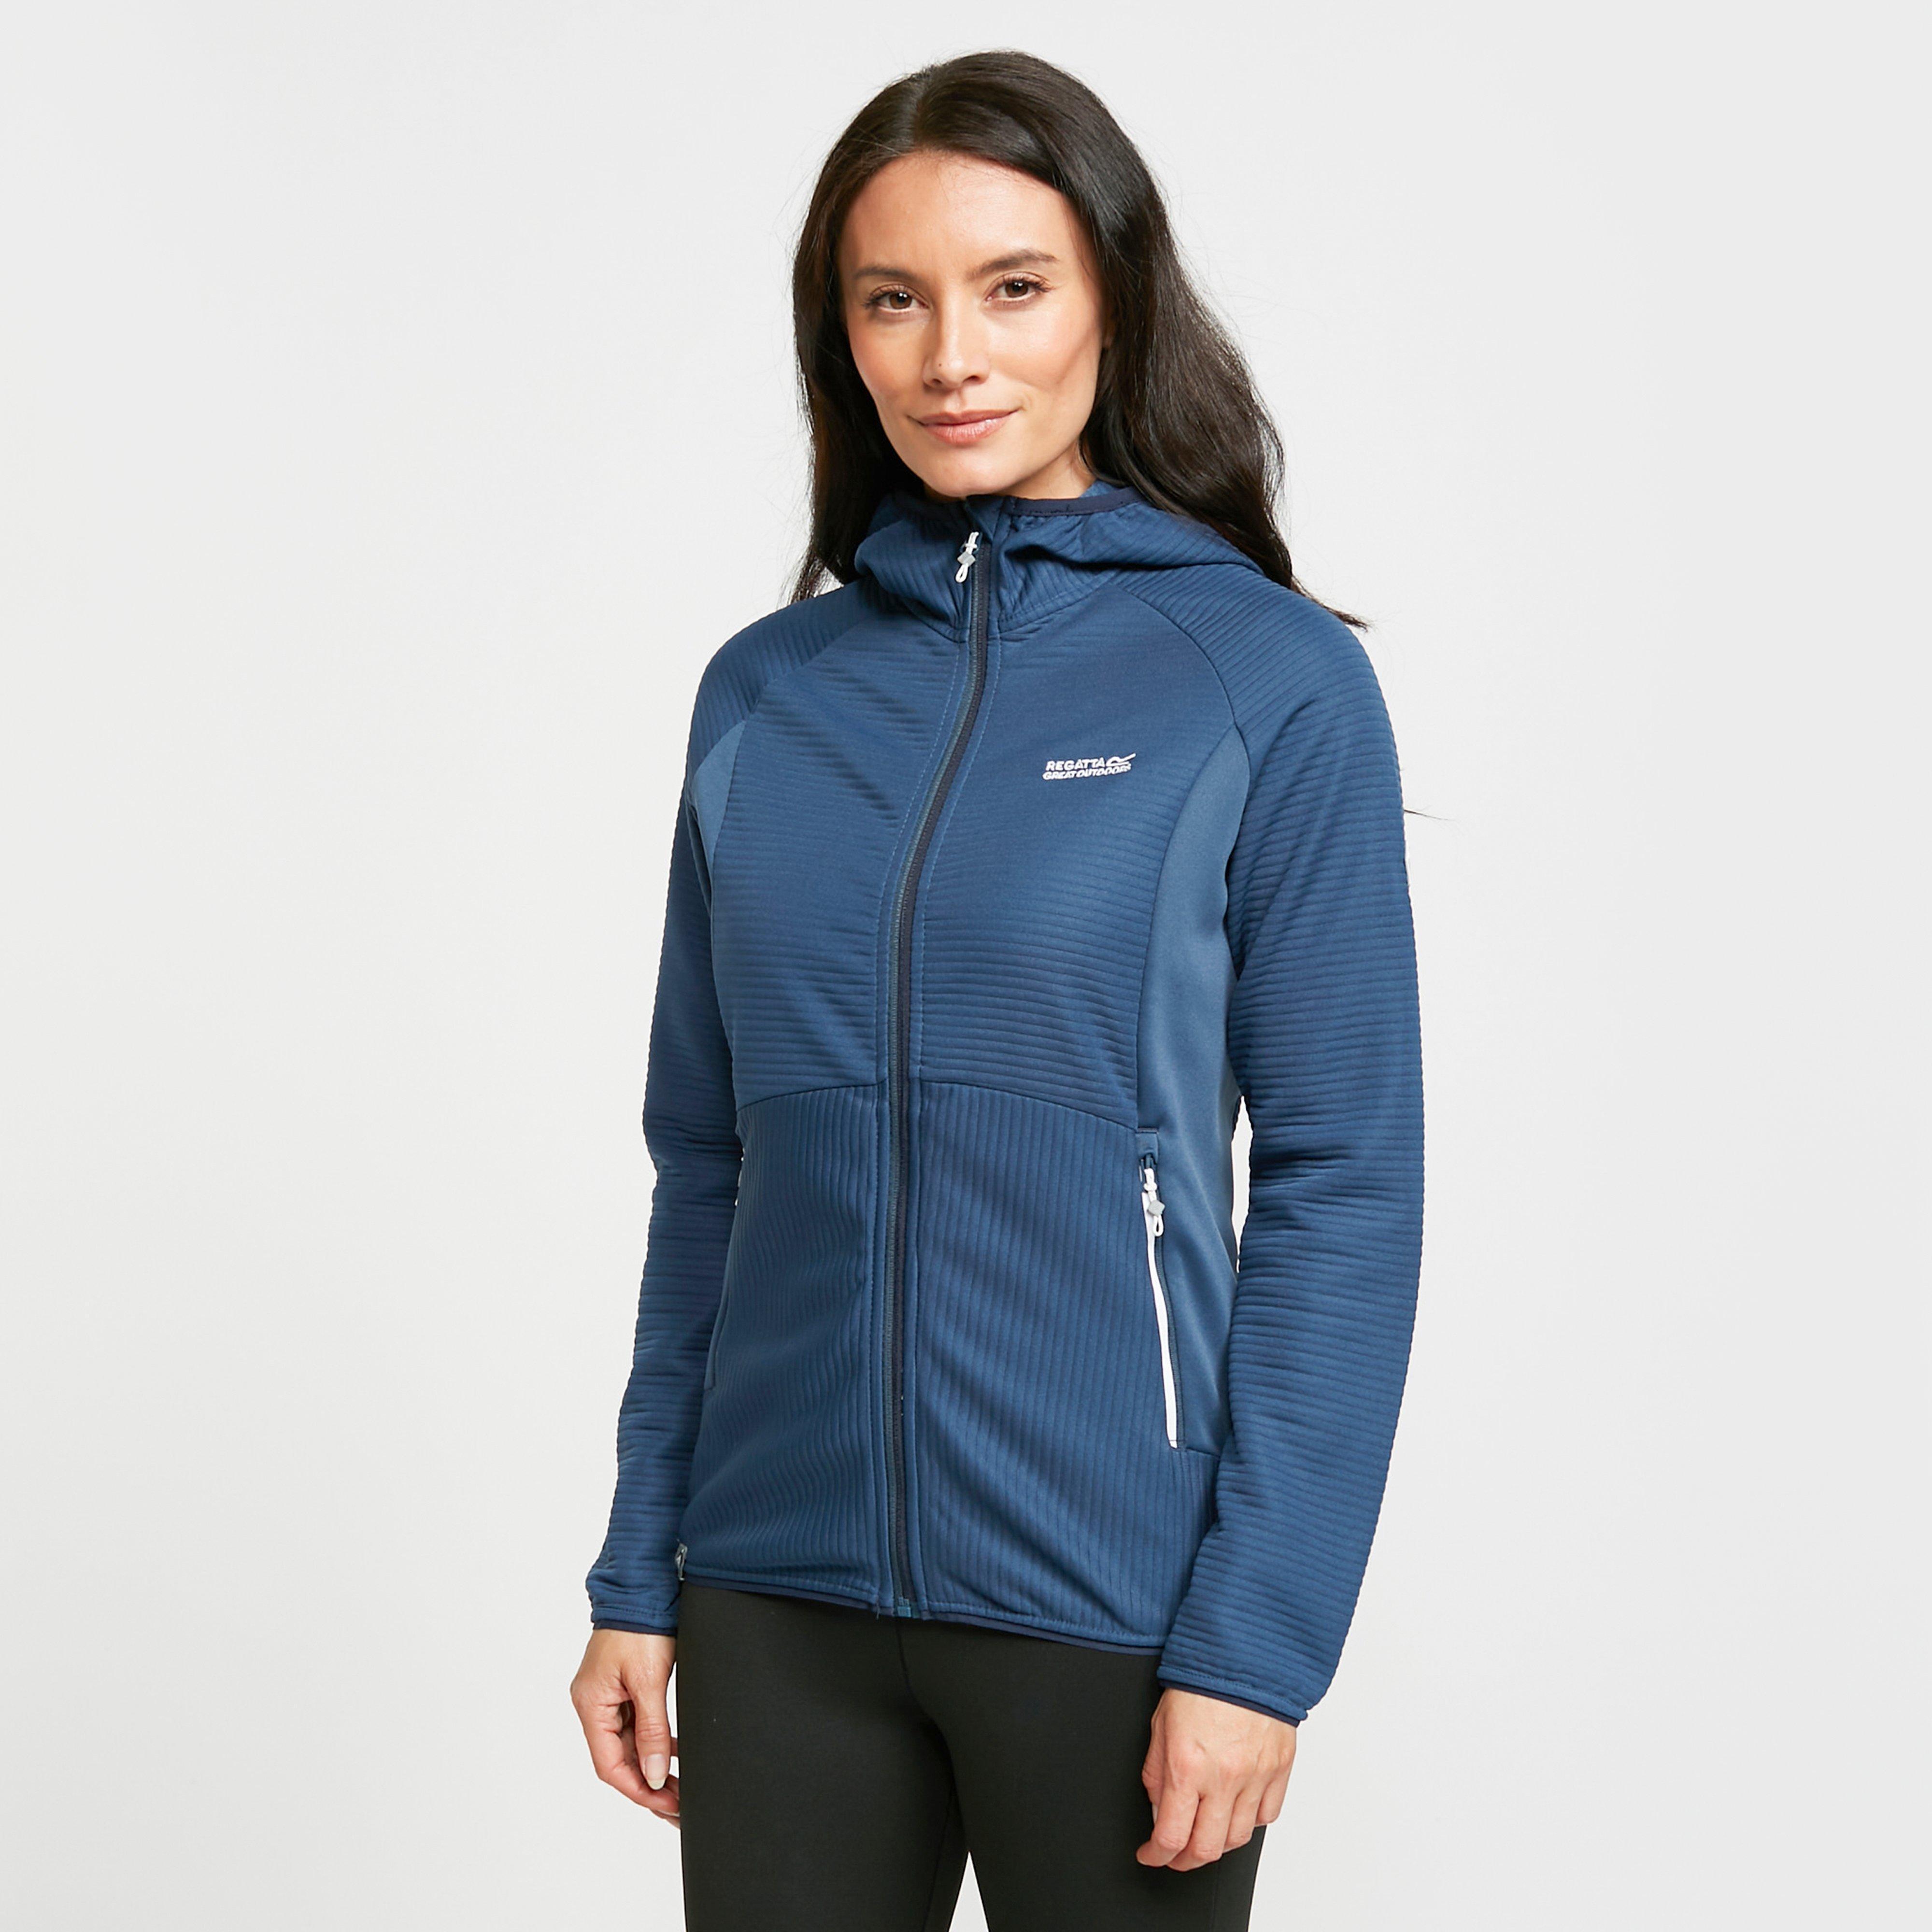 Regatta Regatta Womens Terota Full-Zip Fleece, Blue